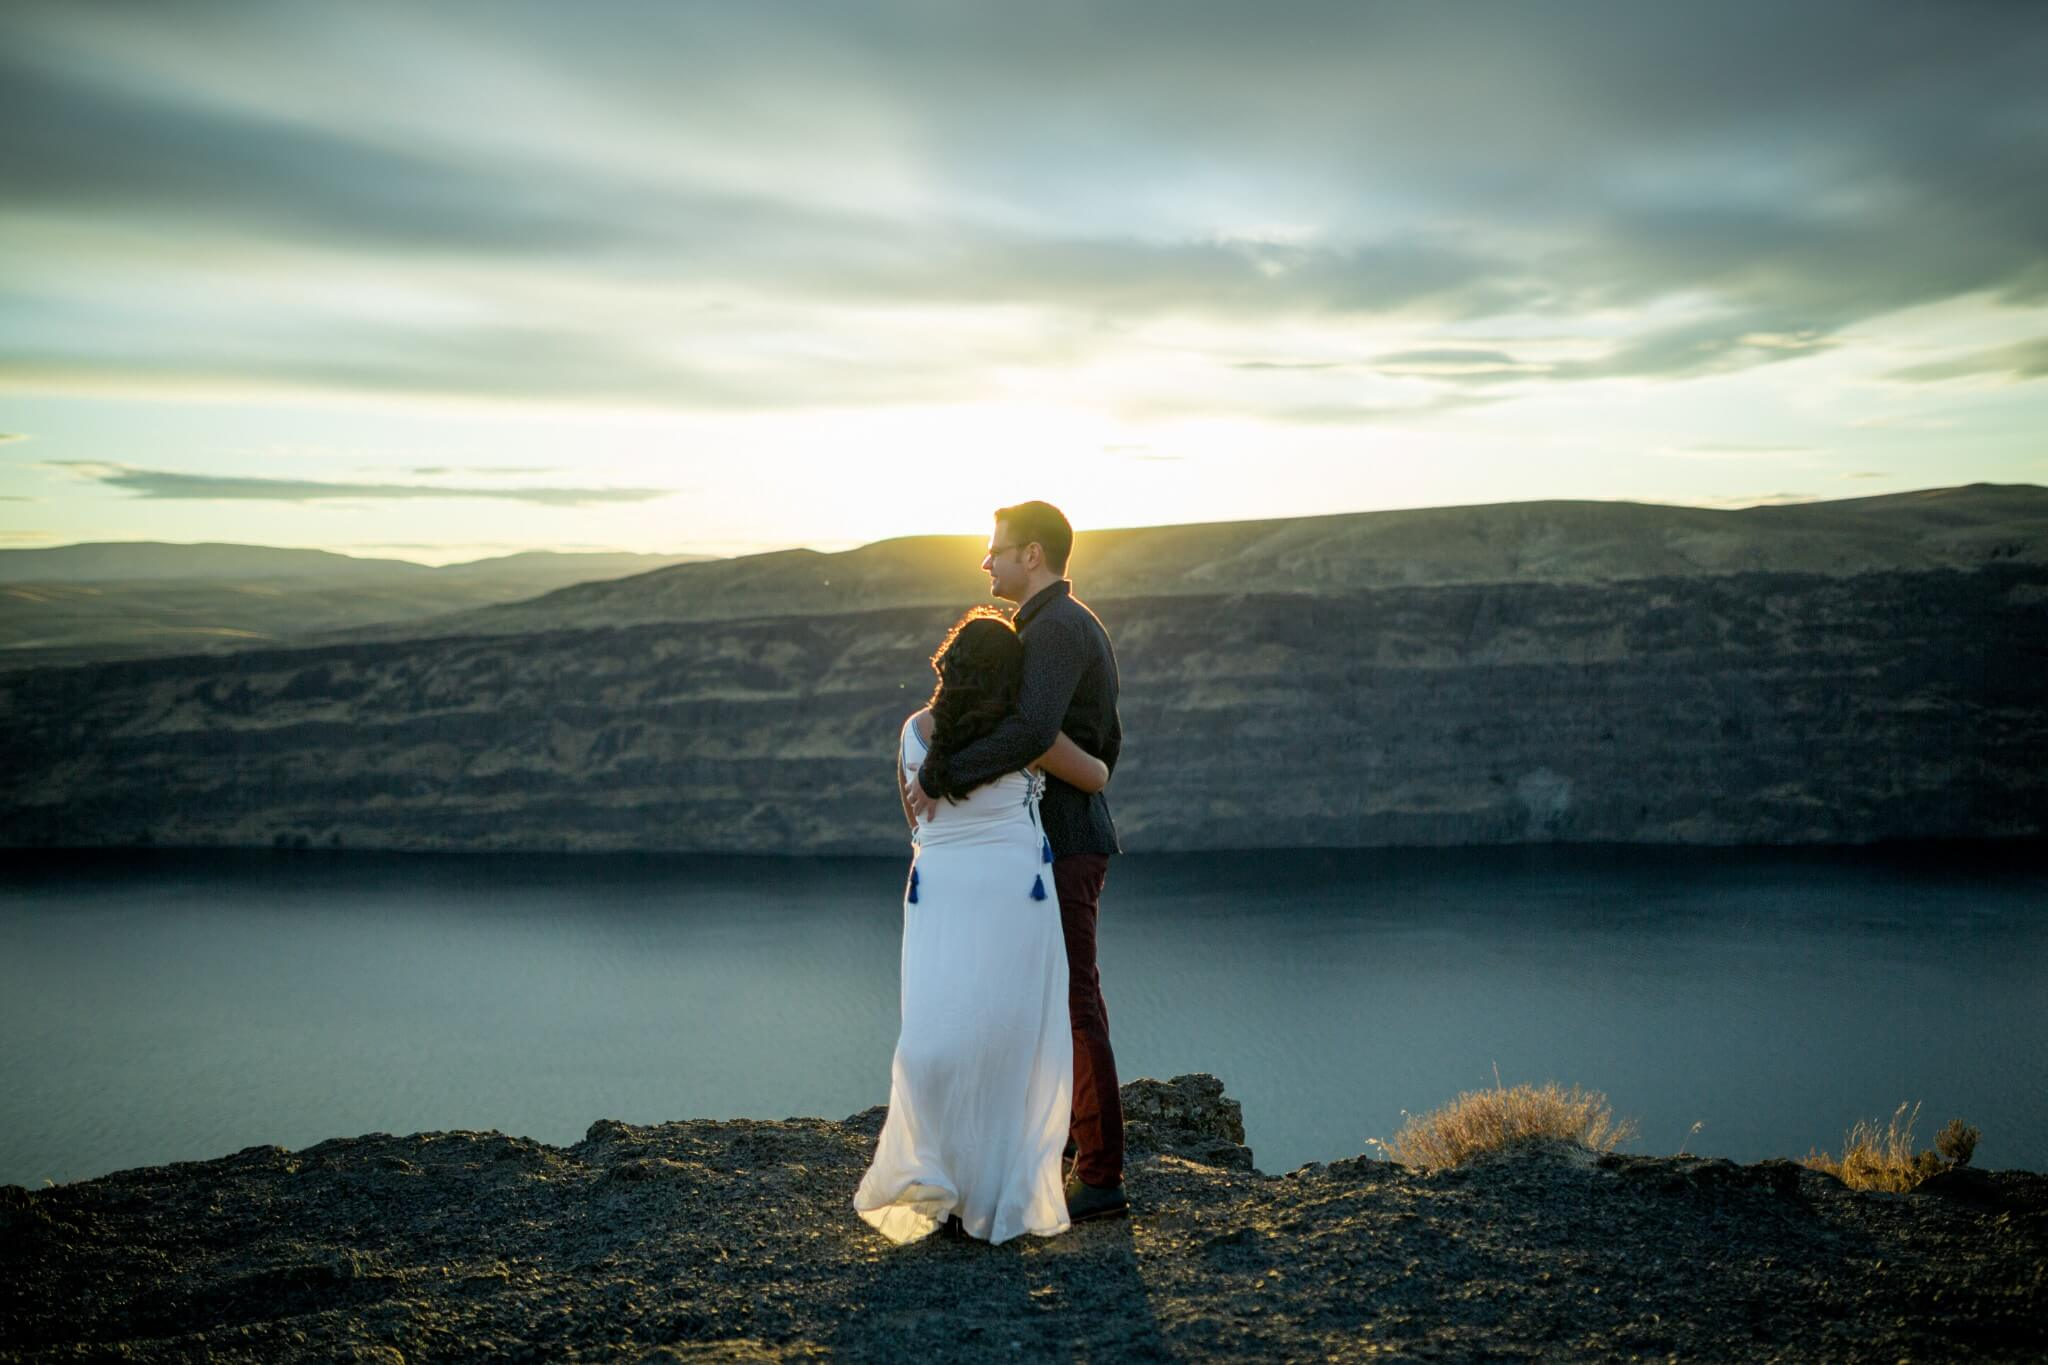 Lesly & Michael Vantage Engagement by Bill Weisgerber Spokane Photographer (54 of 71).jpg